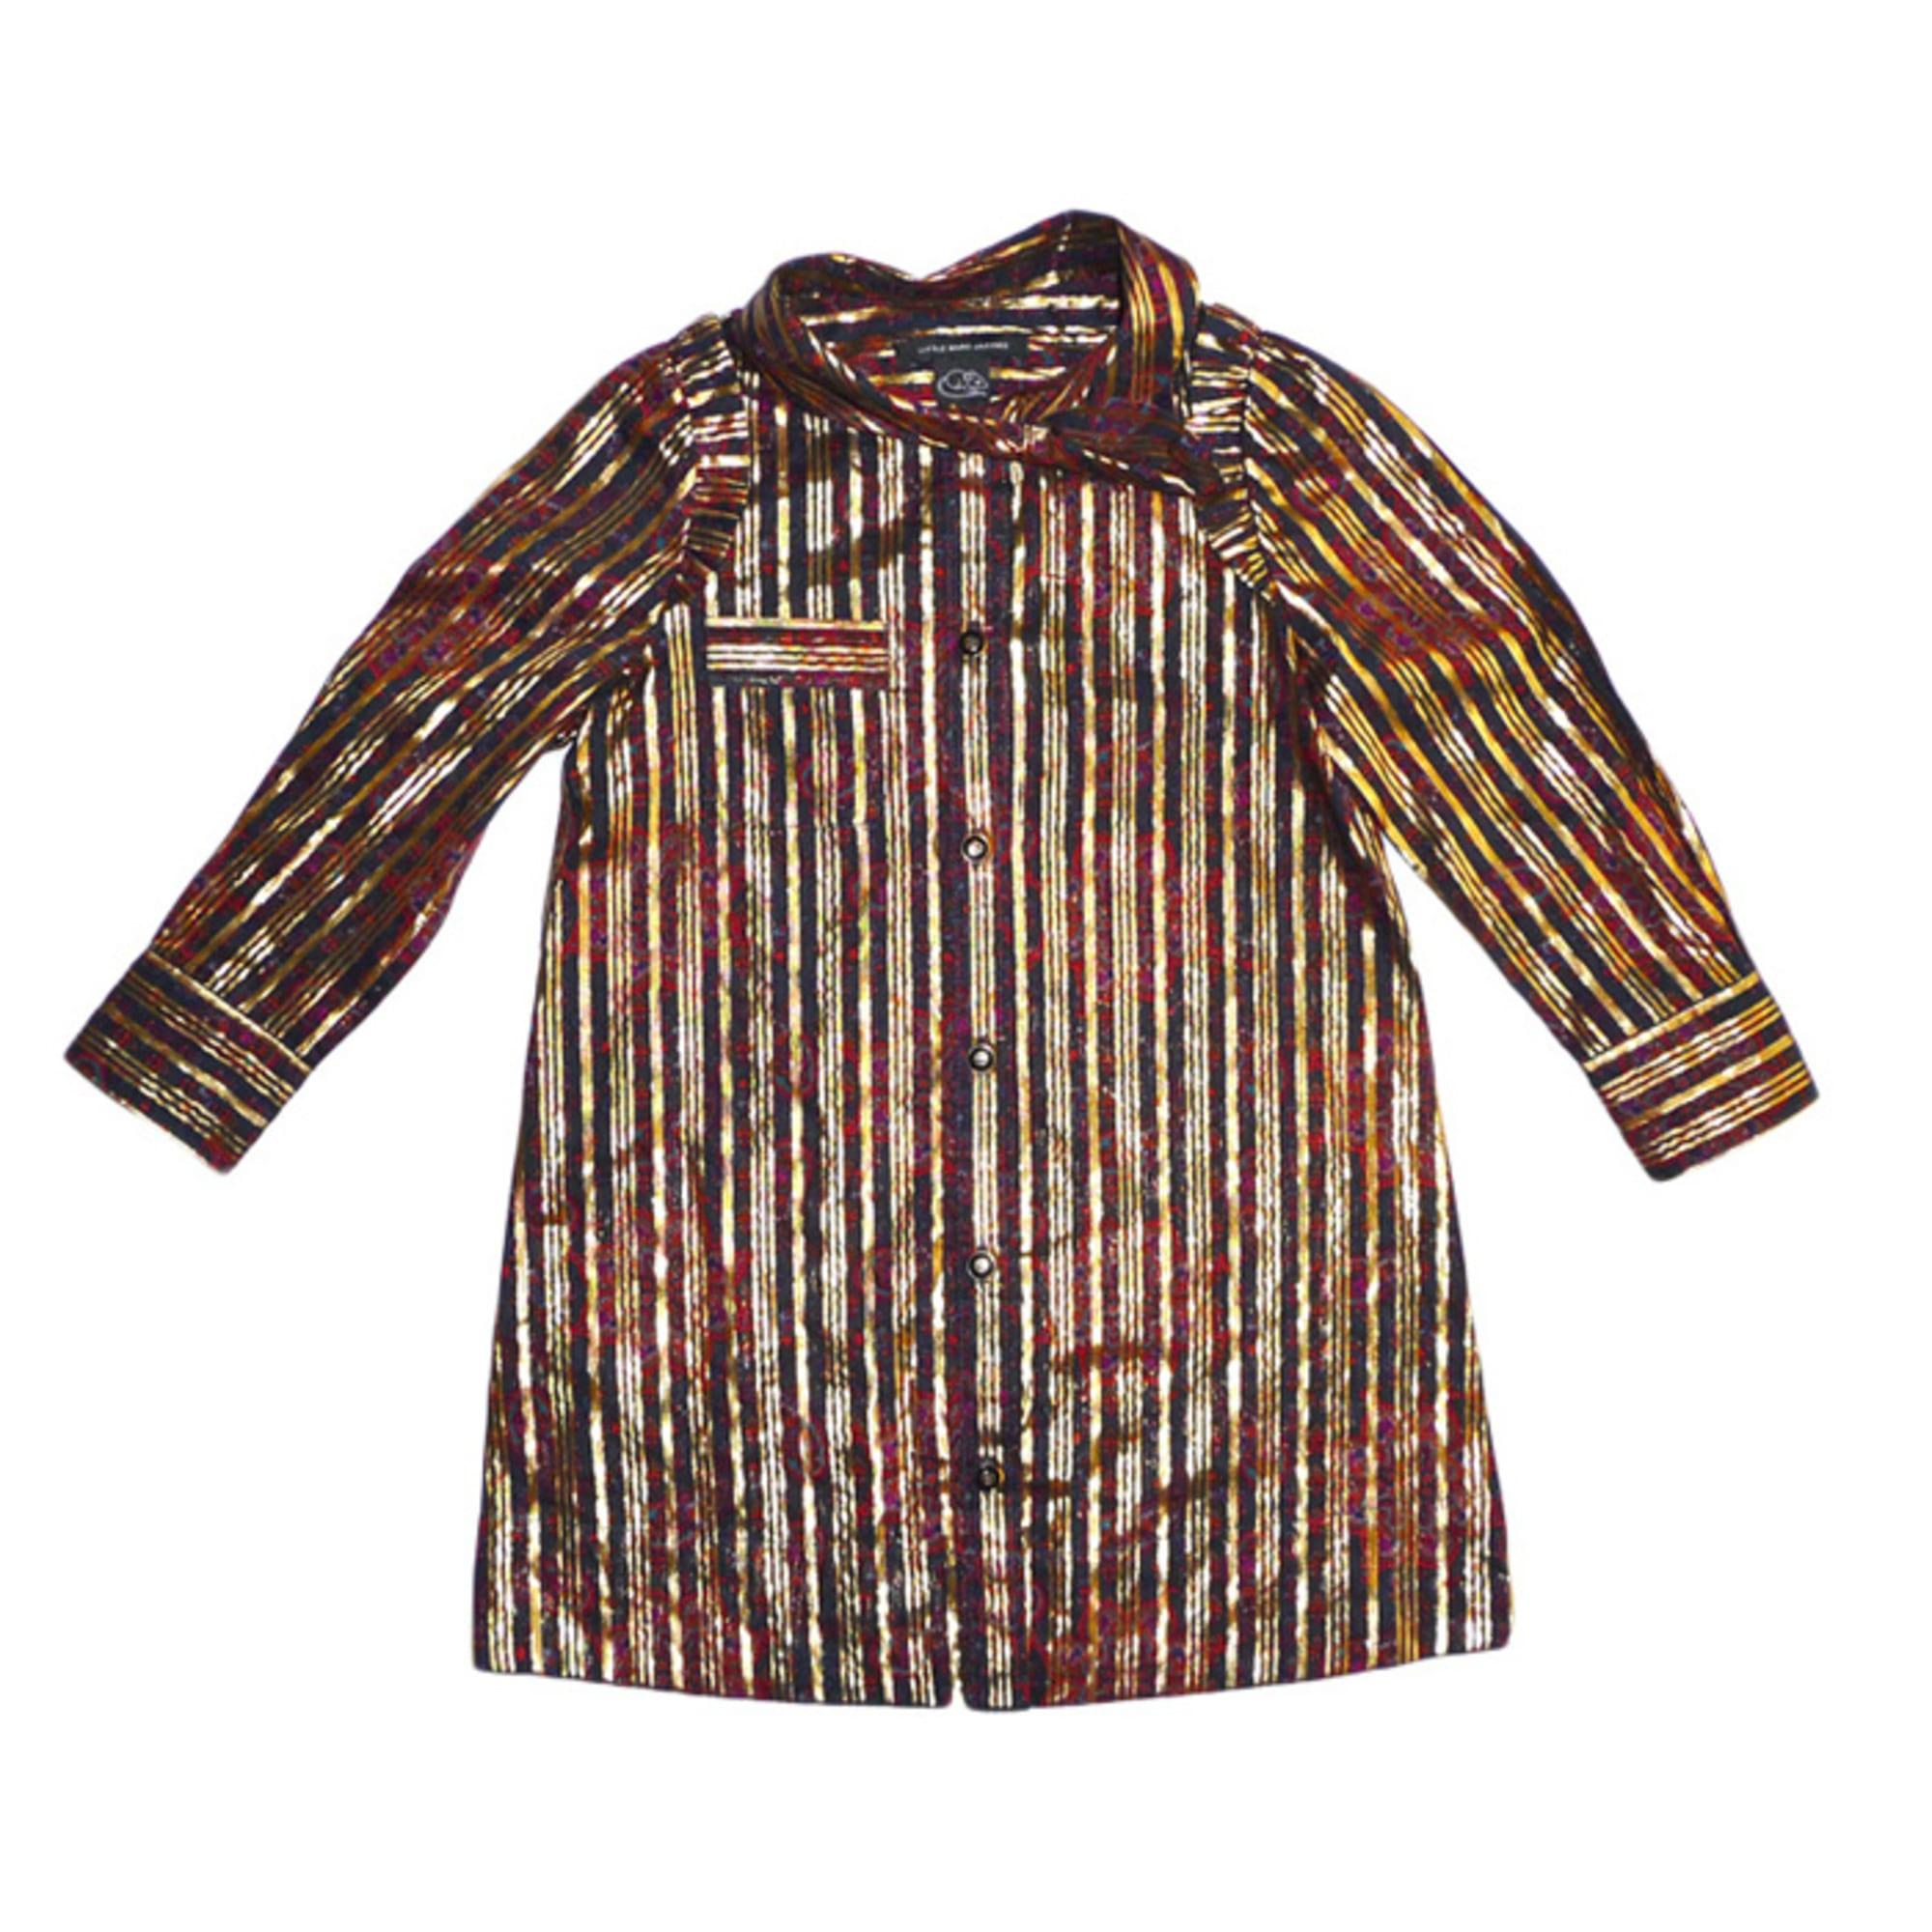 Camicia MARC JACOBS Dorato, bronzo, rame